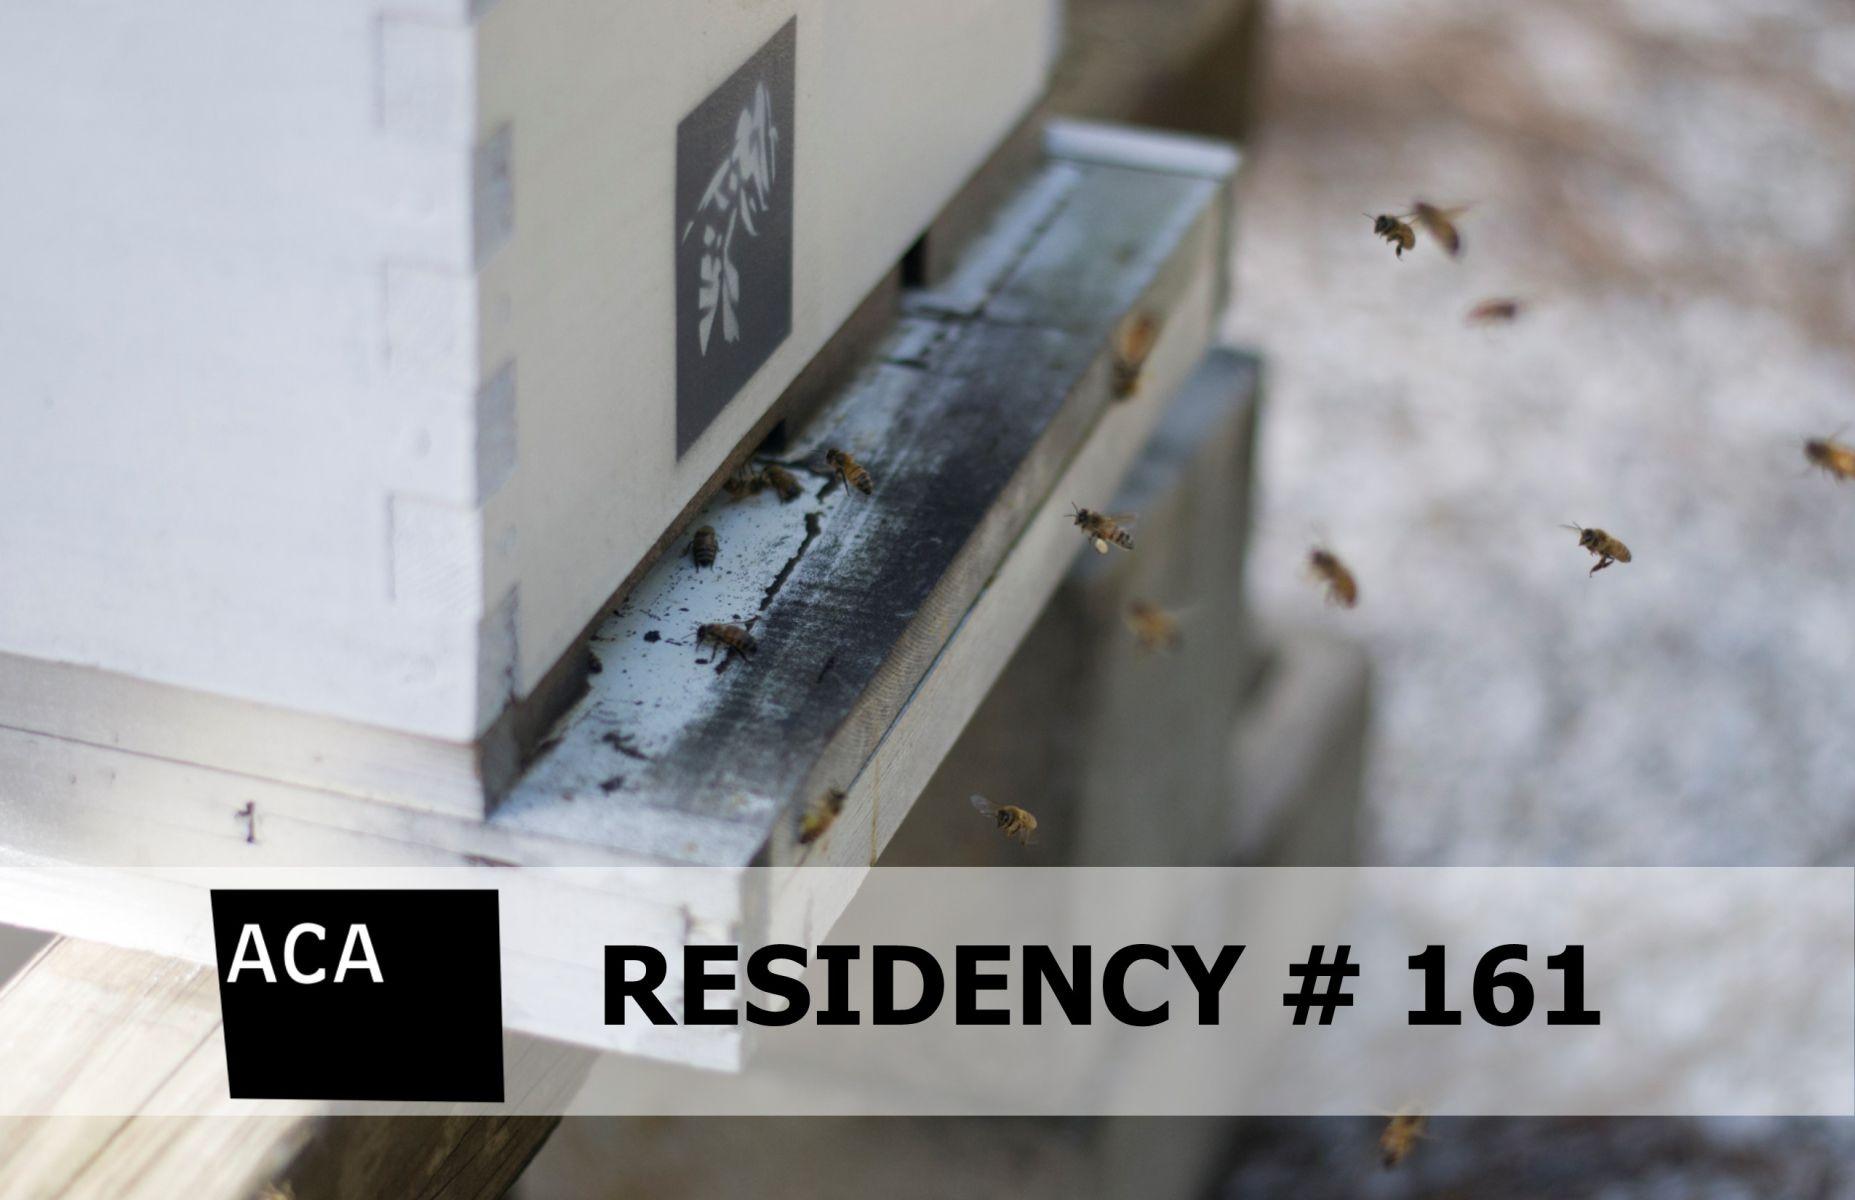 RESIDENCY # 161